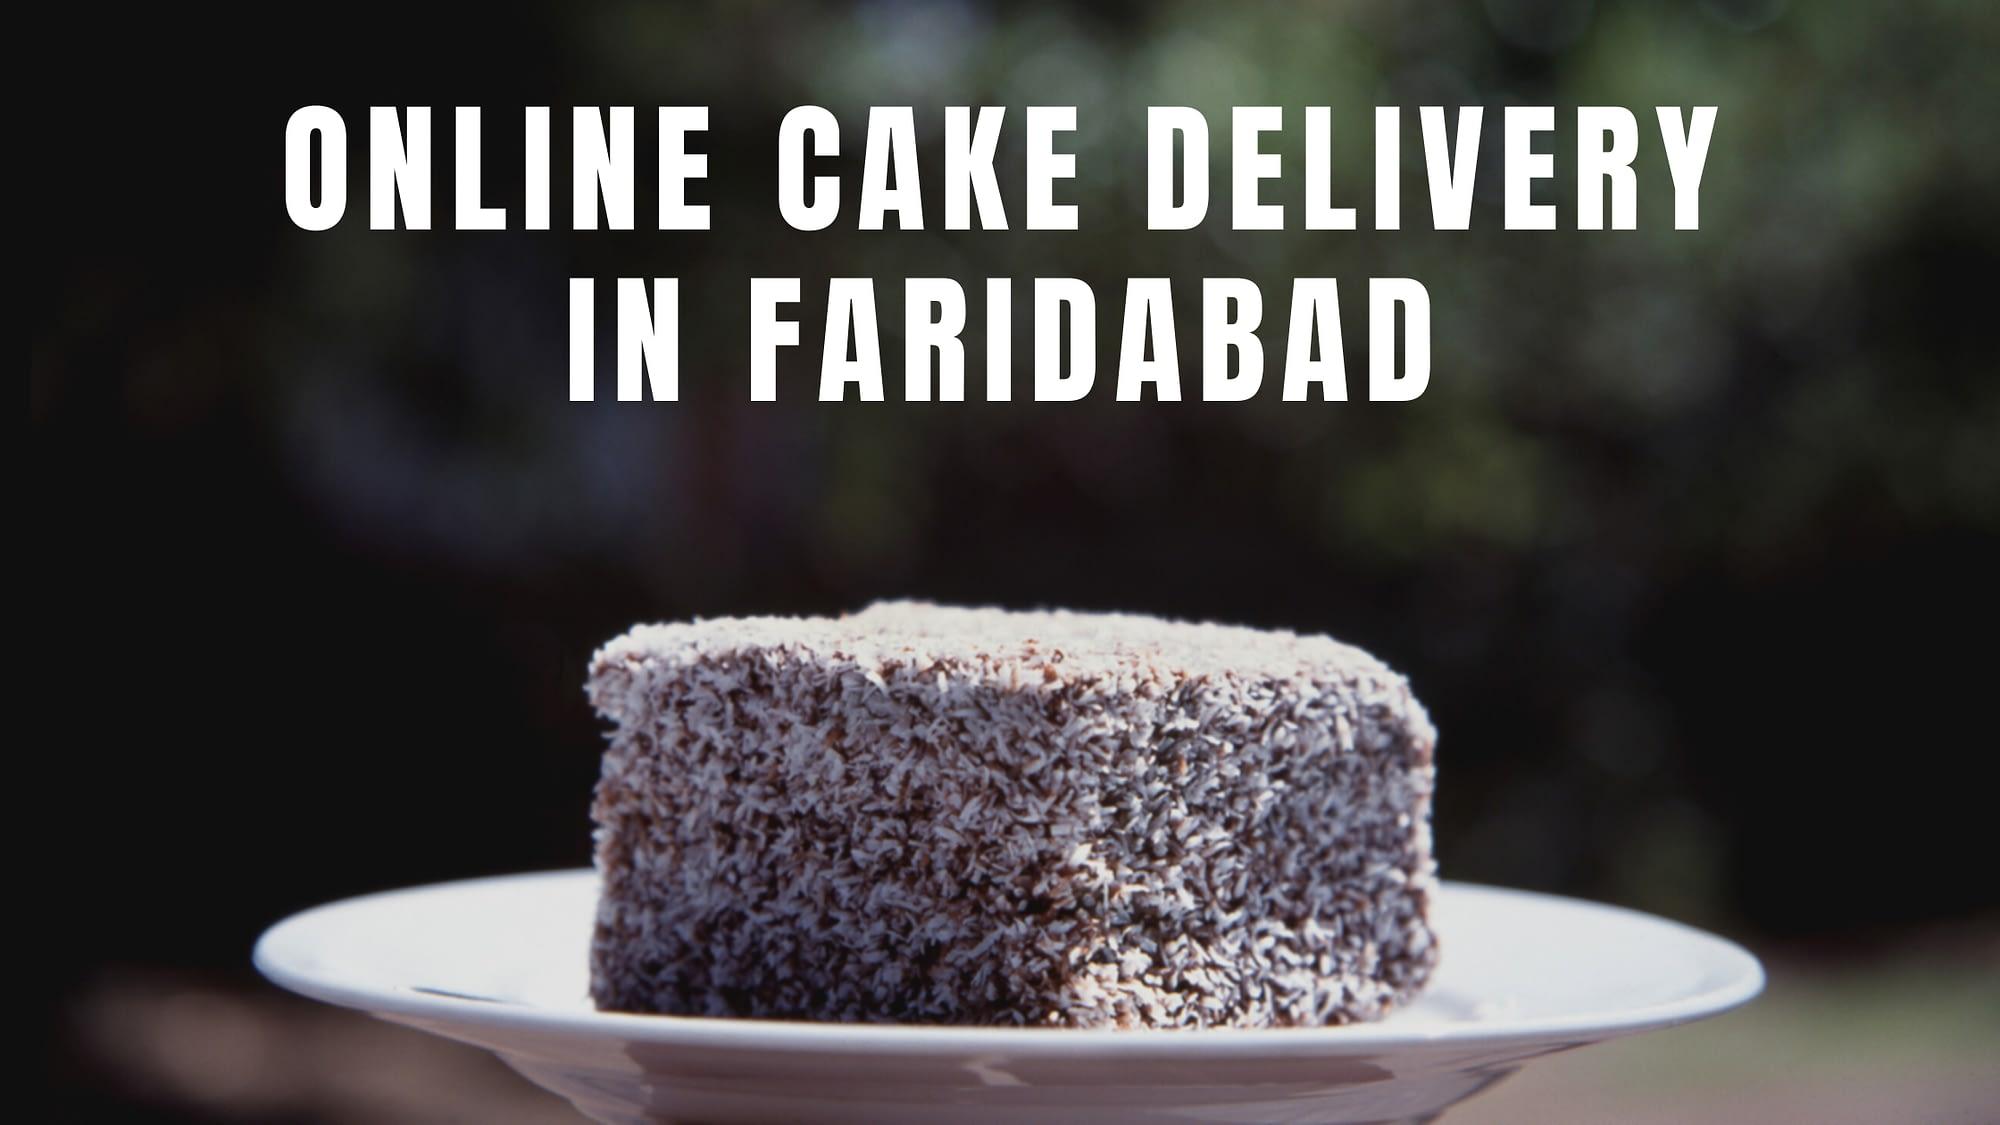 Online cake delivery in Faridabad through Faridabadcake